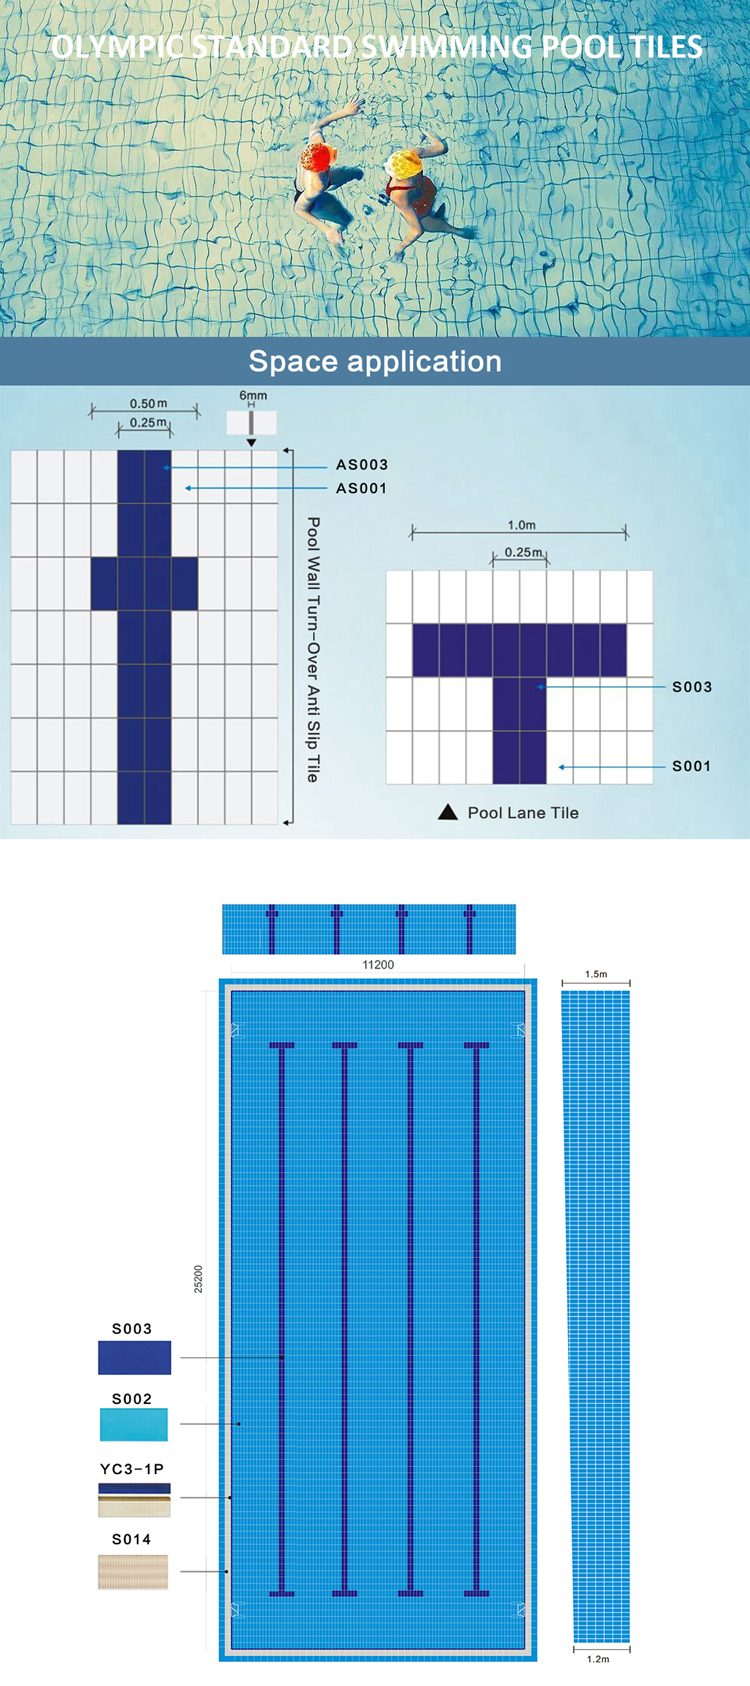 थोक मूल्य 100% चीनी मिट्टी के बरतन स्विमिंग पूल के लिए चीनी मिट्टी मोज़ेक टाइल स्विमिंग पूल, स्पा, 23x23mm (1x1 इंच), 48x48mm (2x2 इंच)